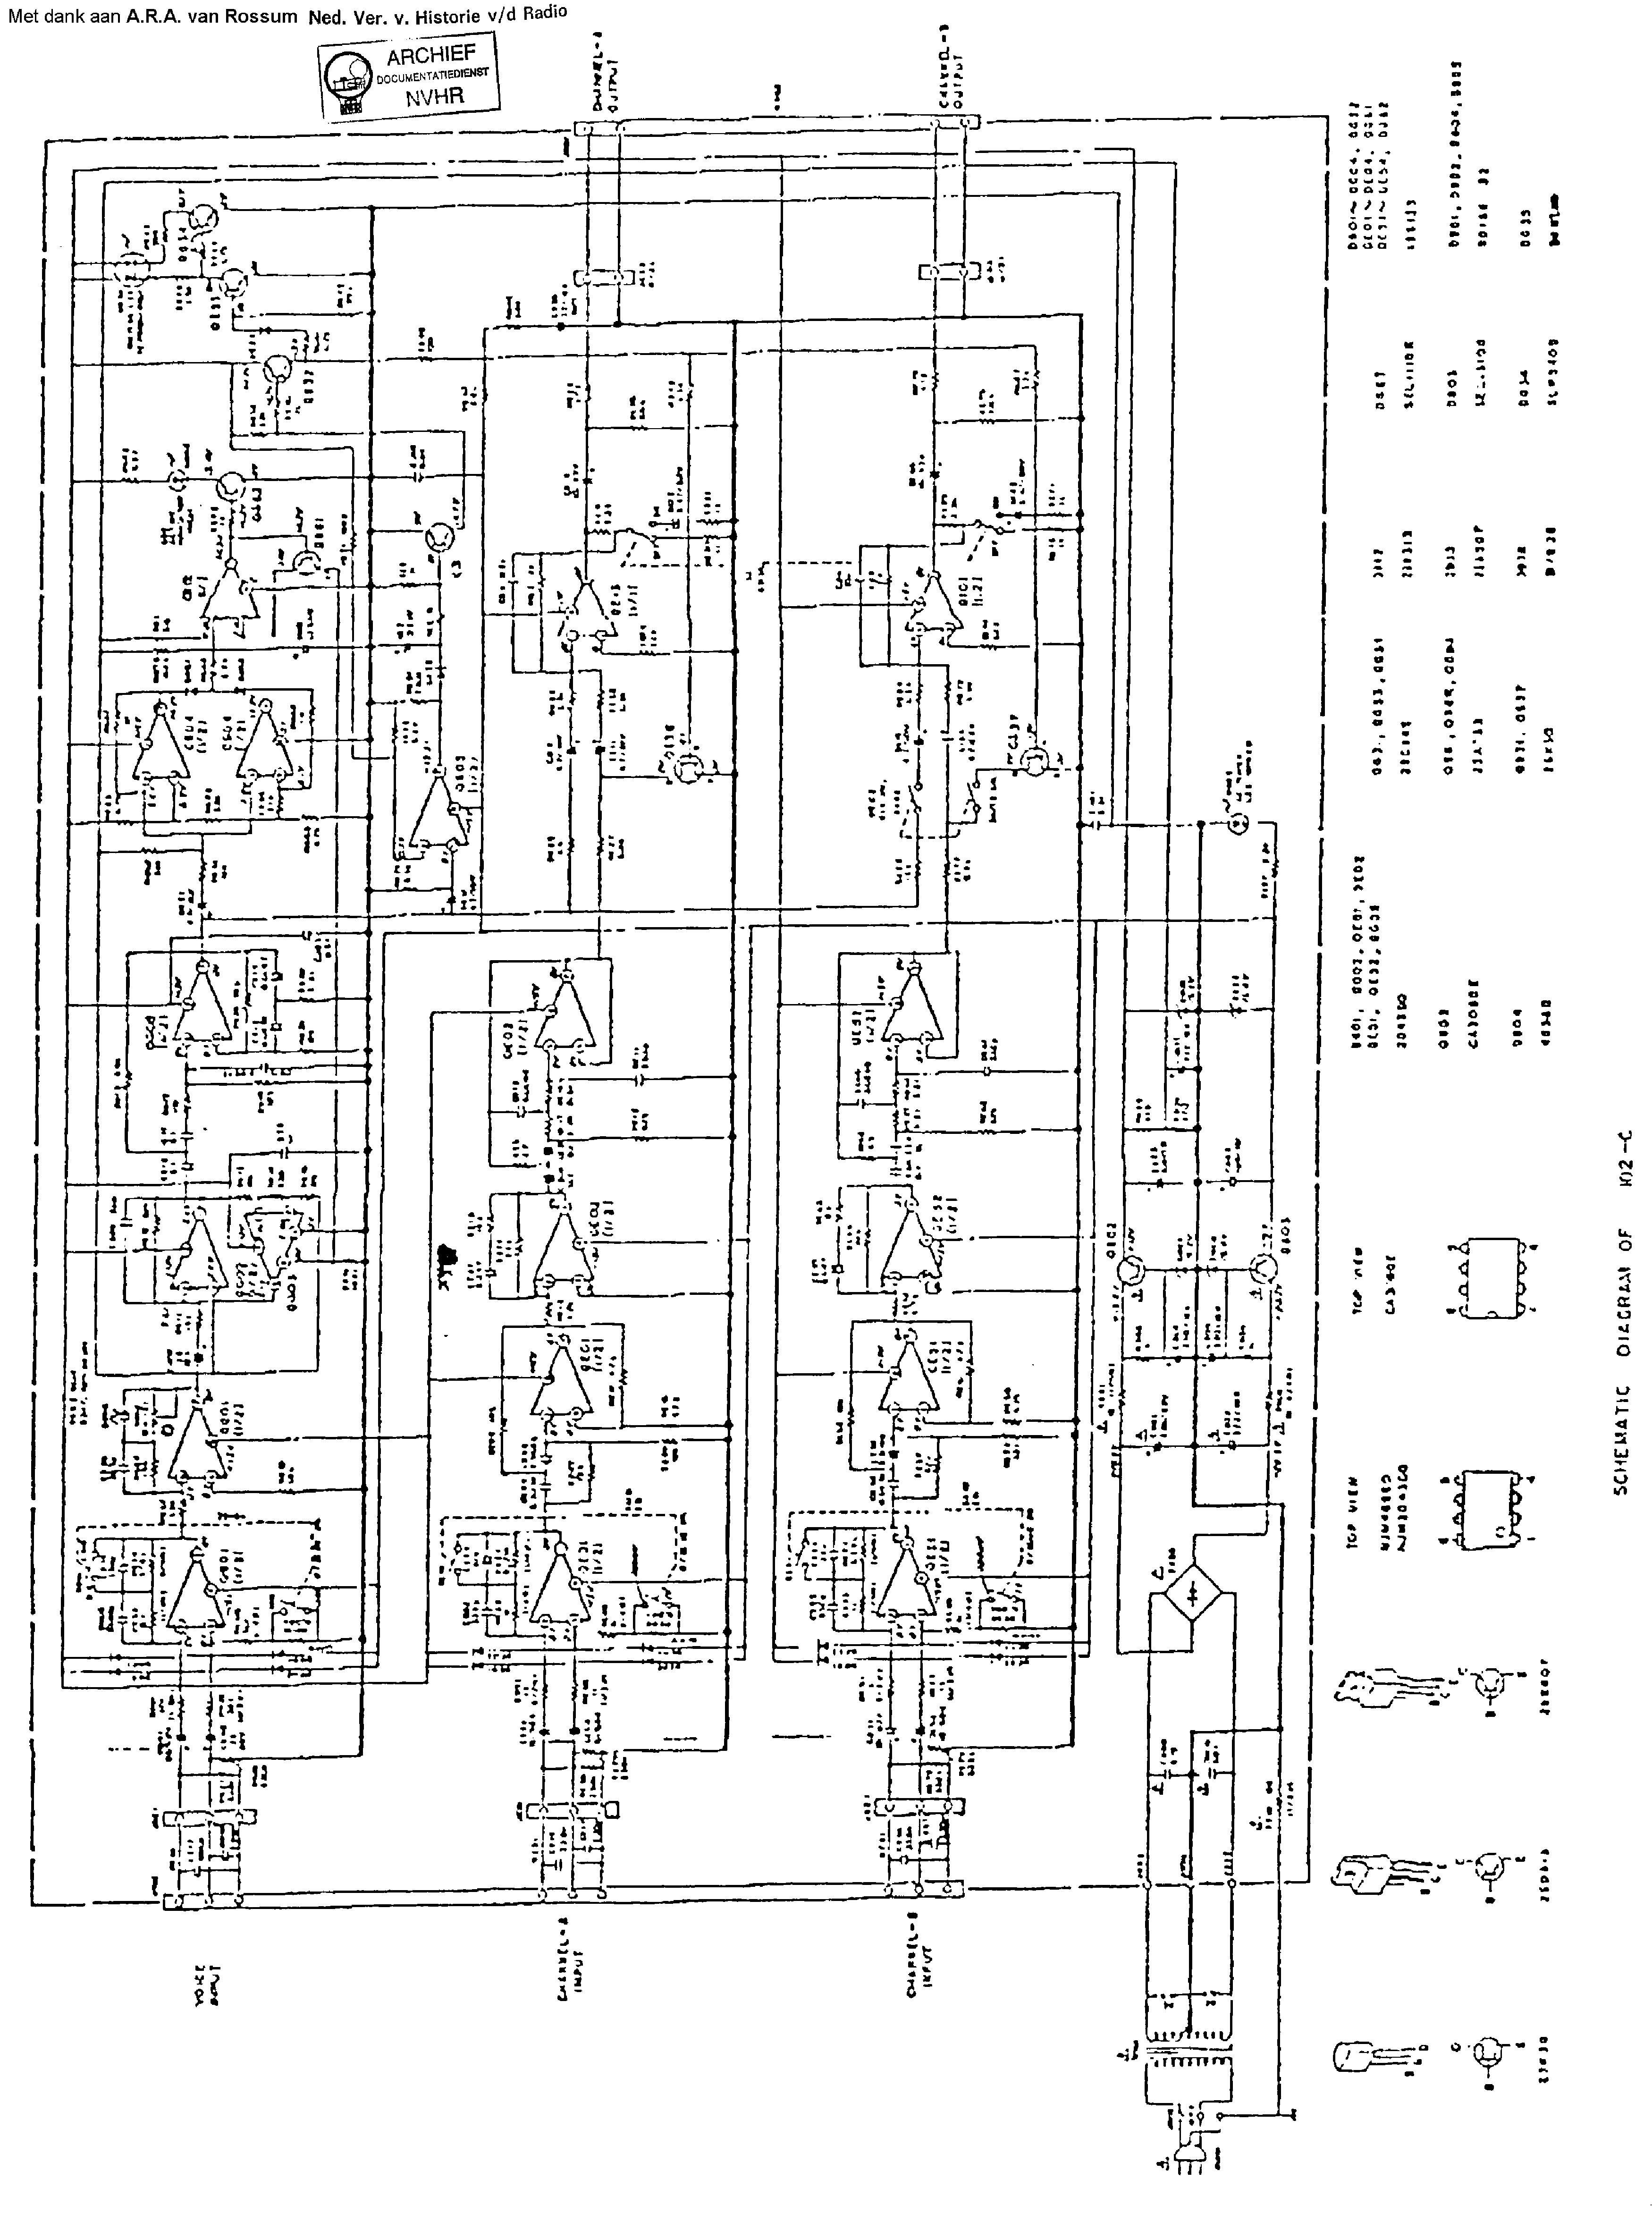 Bose Lsps Speaker System Wiring Diagram - 2002 Gmc Yukon Fuse Box -  audi-a3.nescafe.jeanjaures37.frWiring Diagram Resource